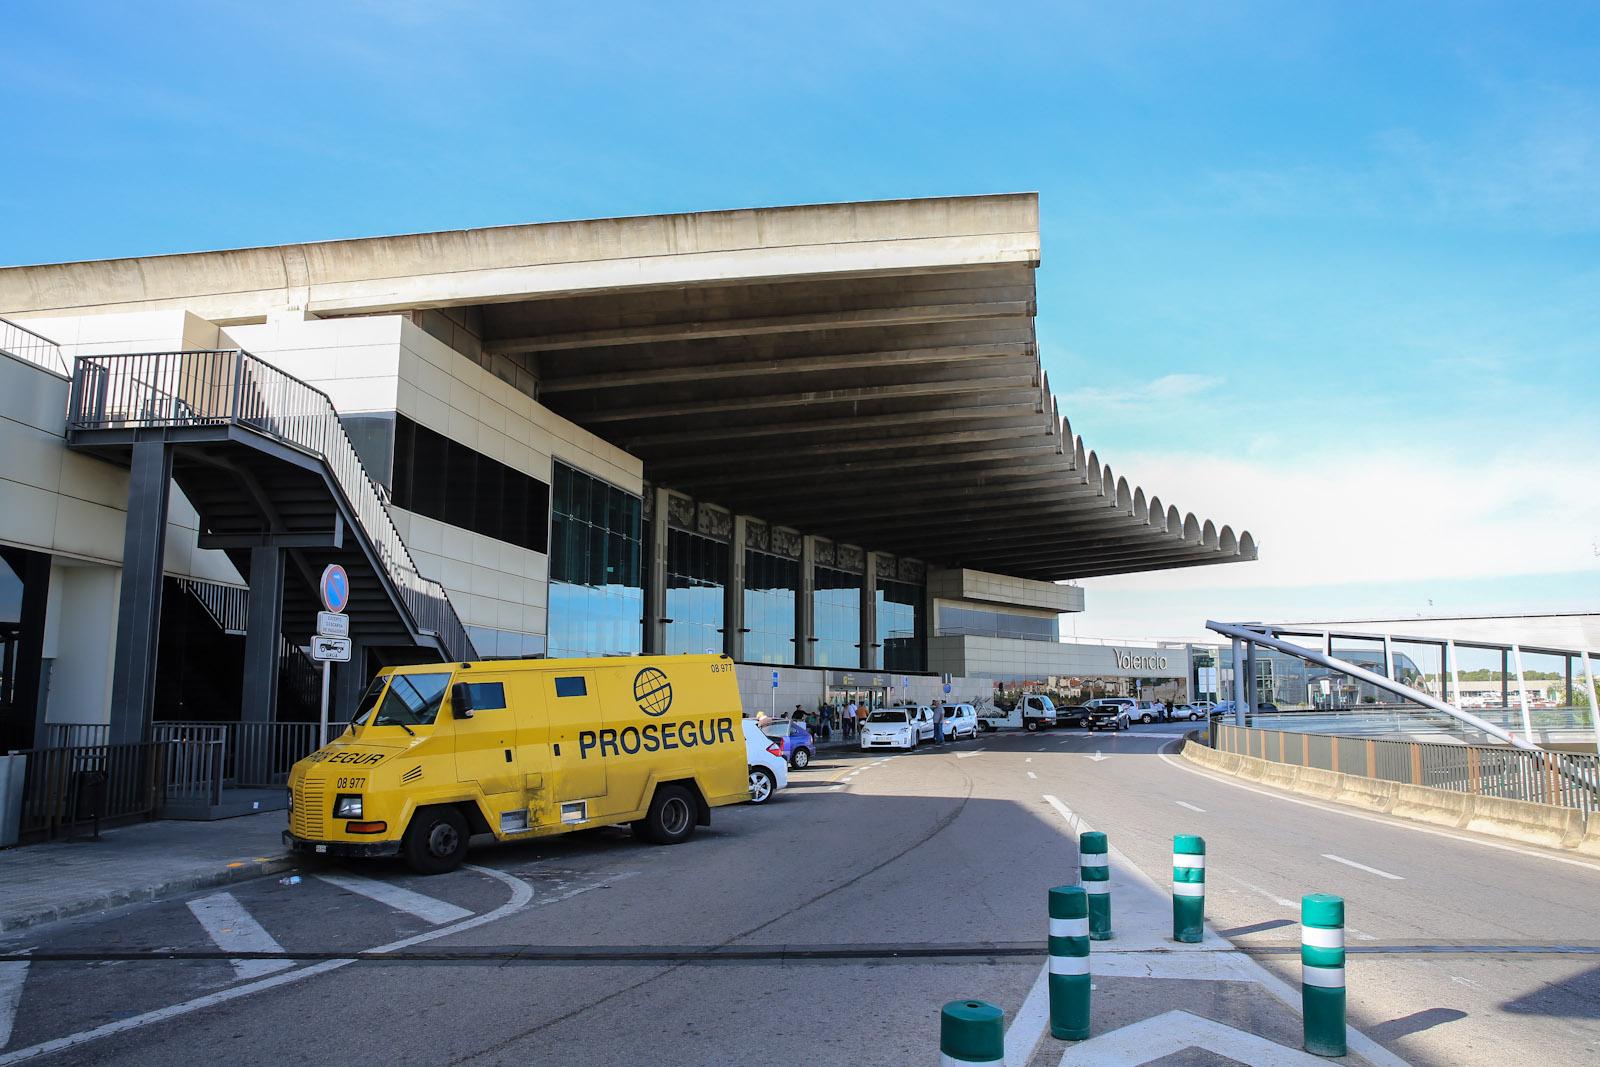 Центральная часть аэровокзала аэропорта Валенсия